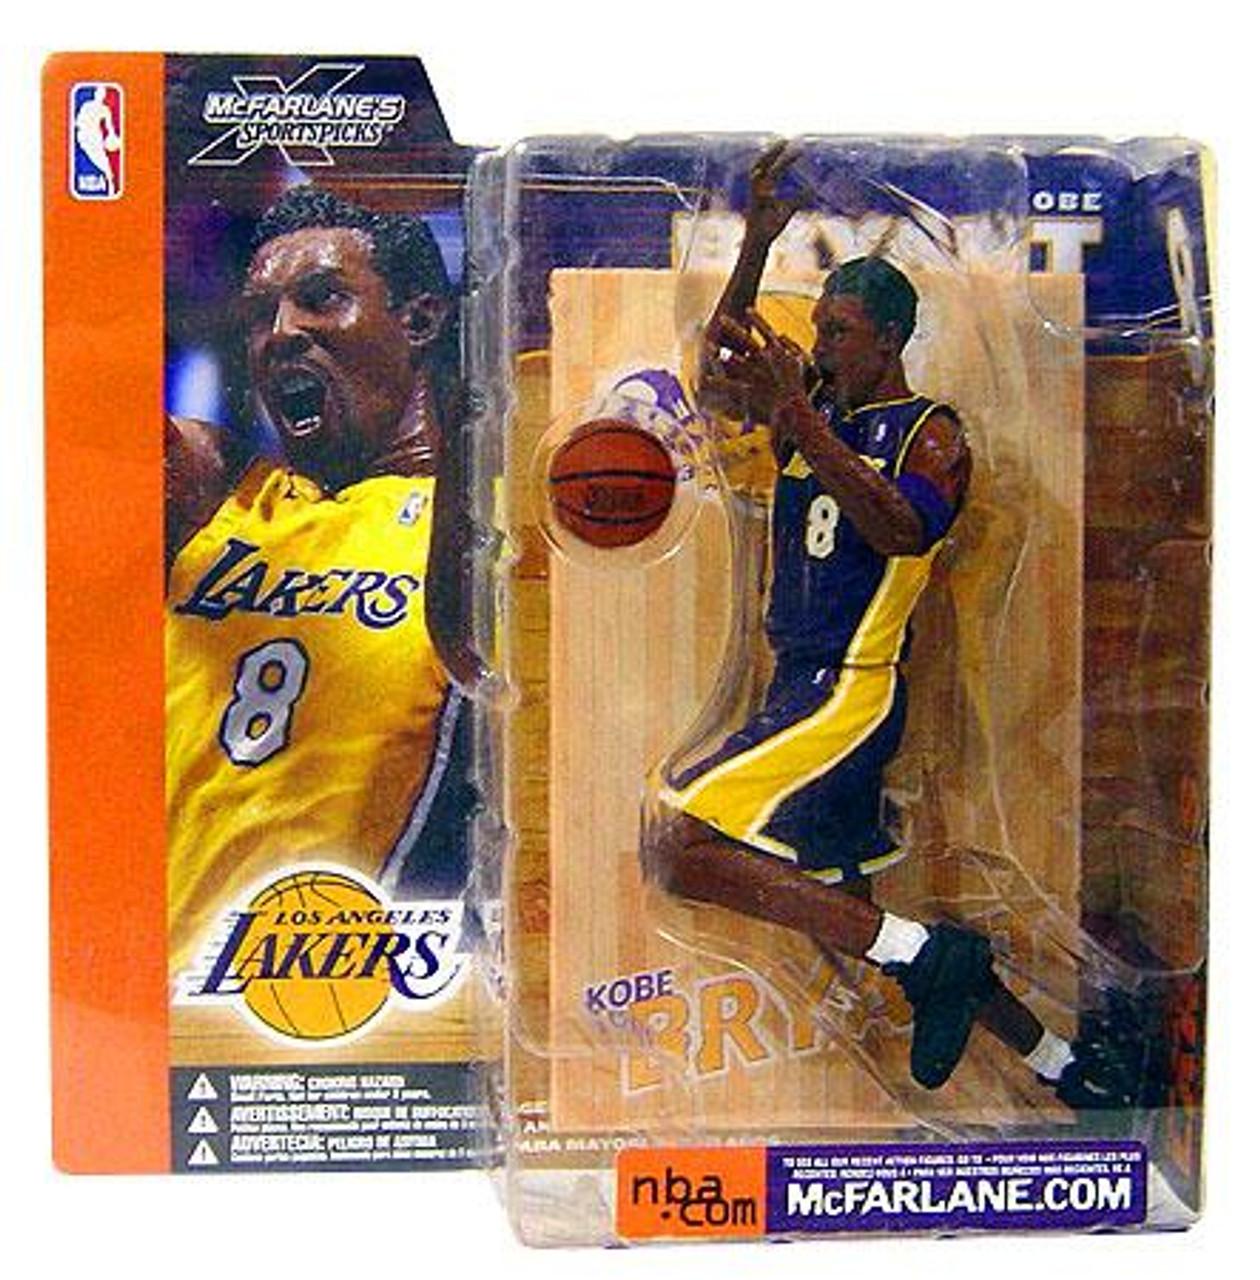 McFarlane Toys NBA Los Angeles Lakers Sports Picks Series 1 Kobe Bryant Action Figure [Purple Jersey Variant]